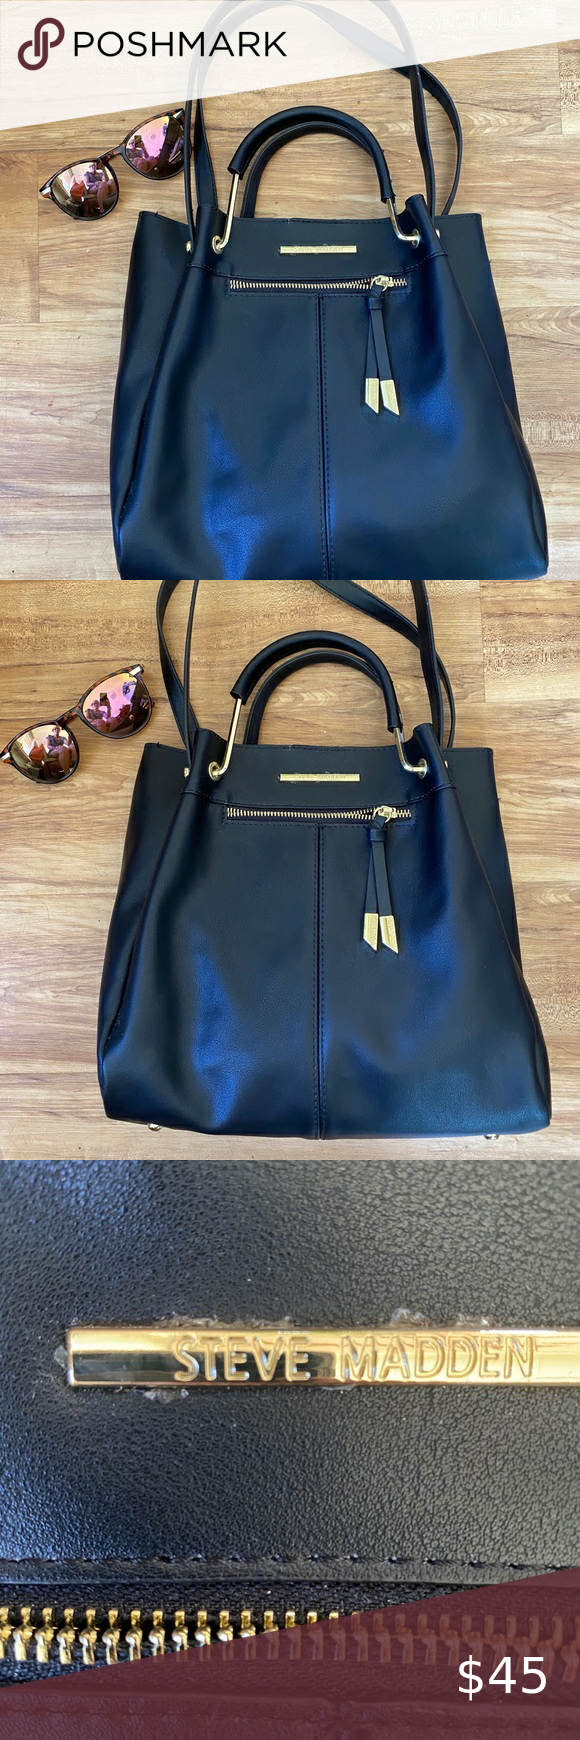 Steve Madden Black Handbag Purse With Makeup Bag Black Handbags Bags Handbag